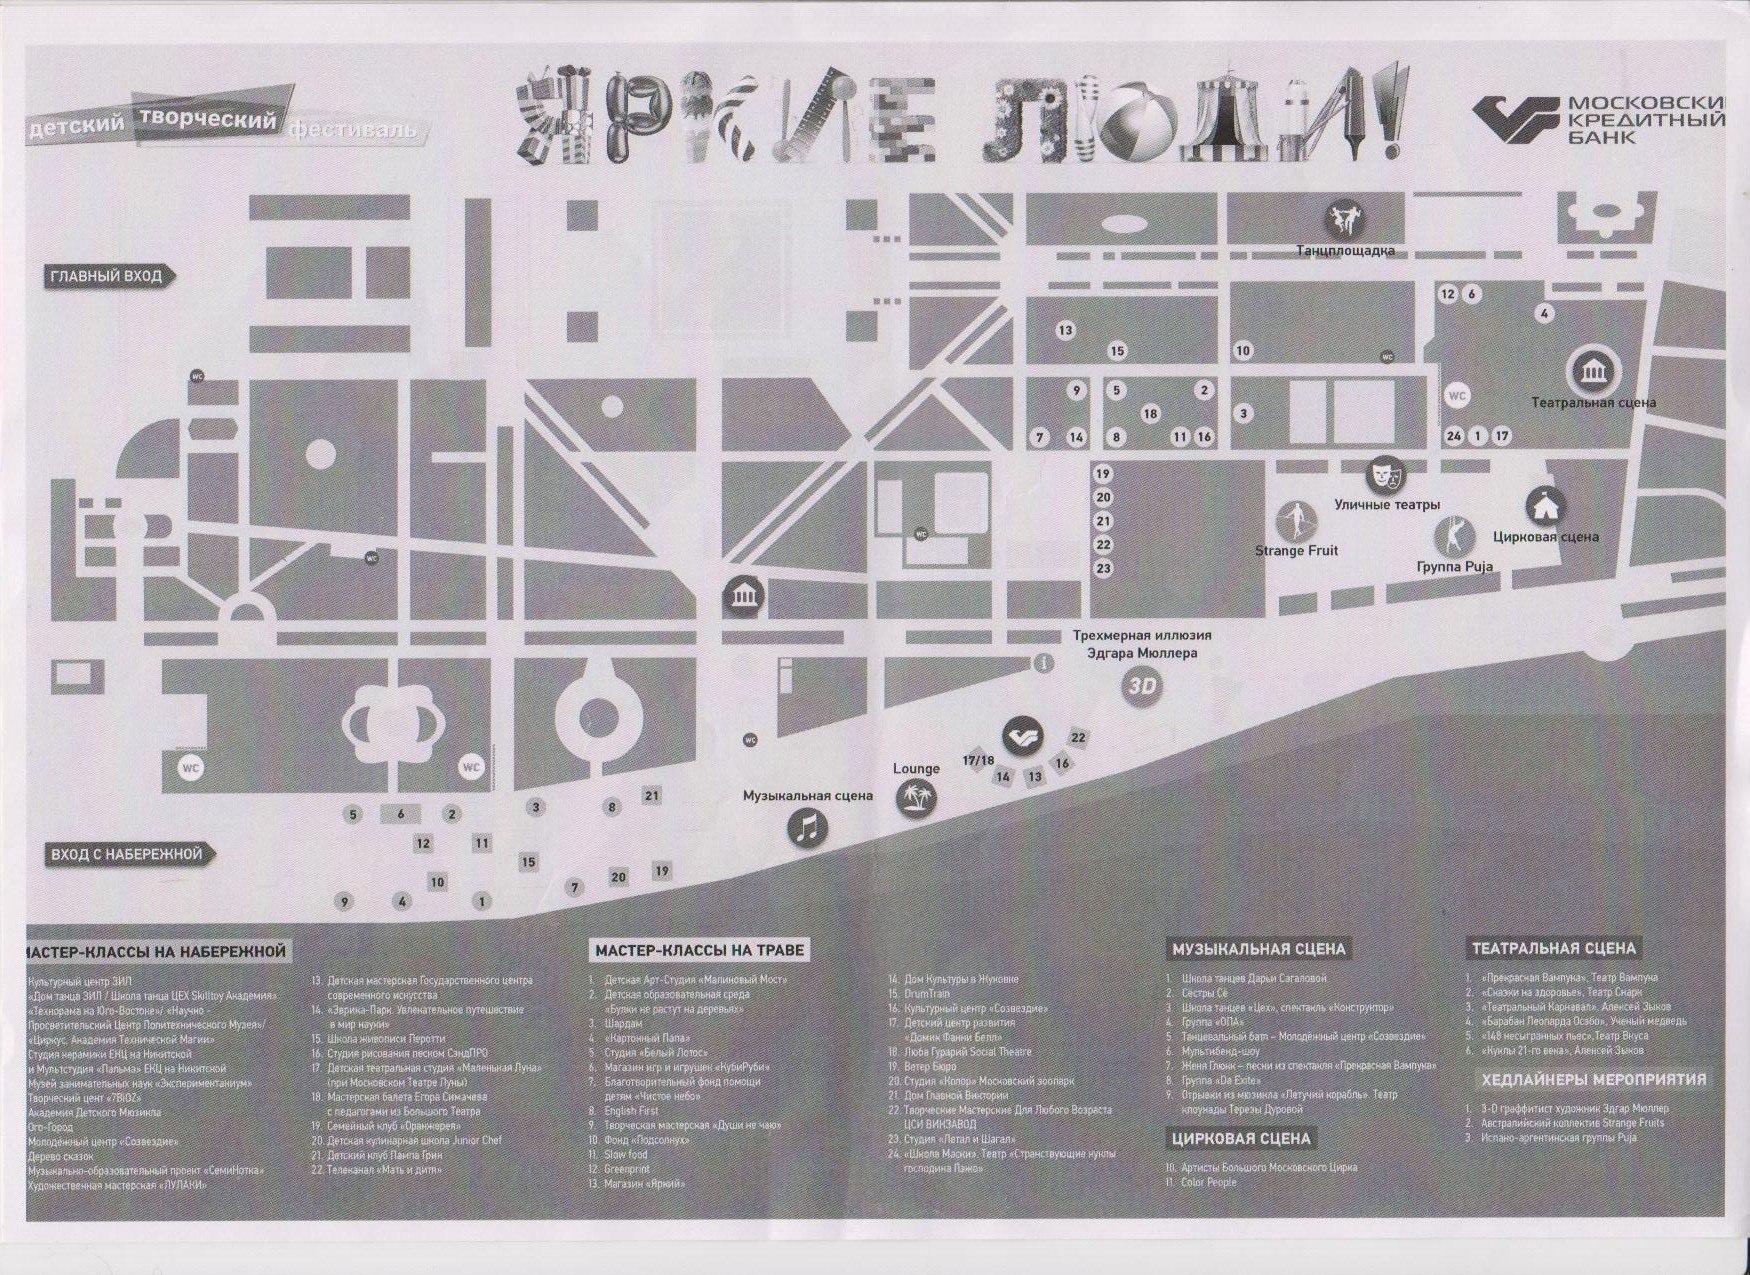 парк имени горького москва план схема